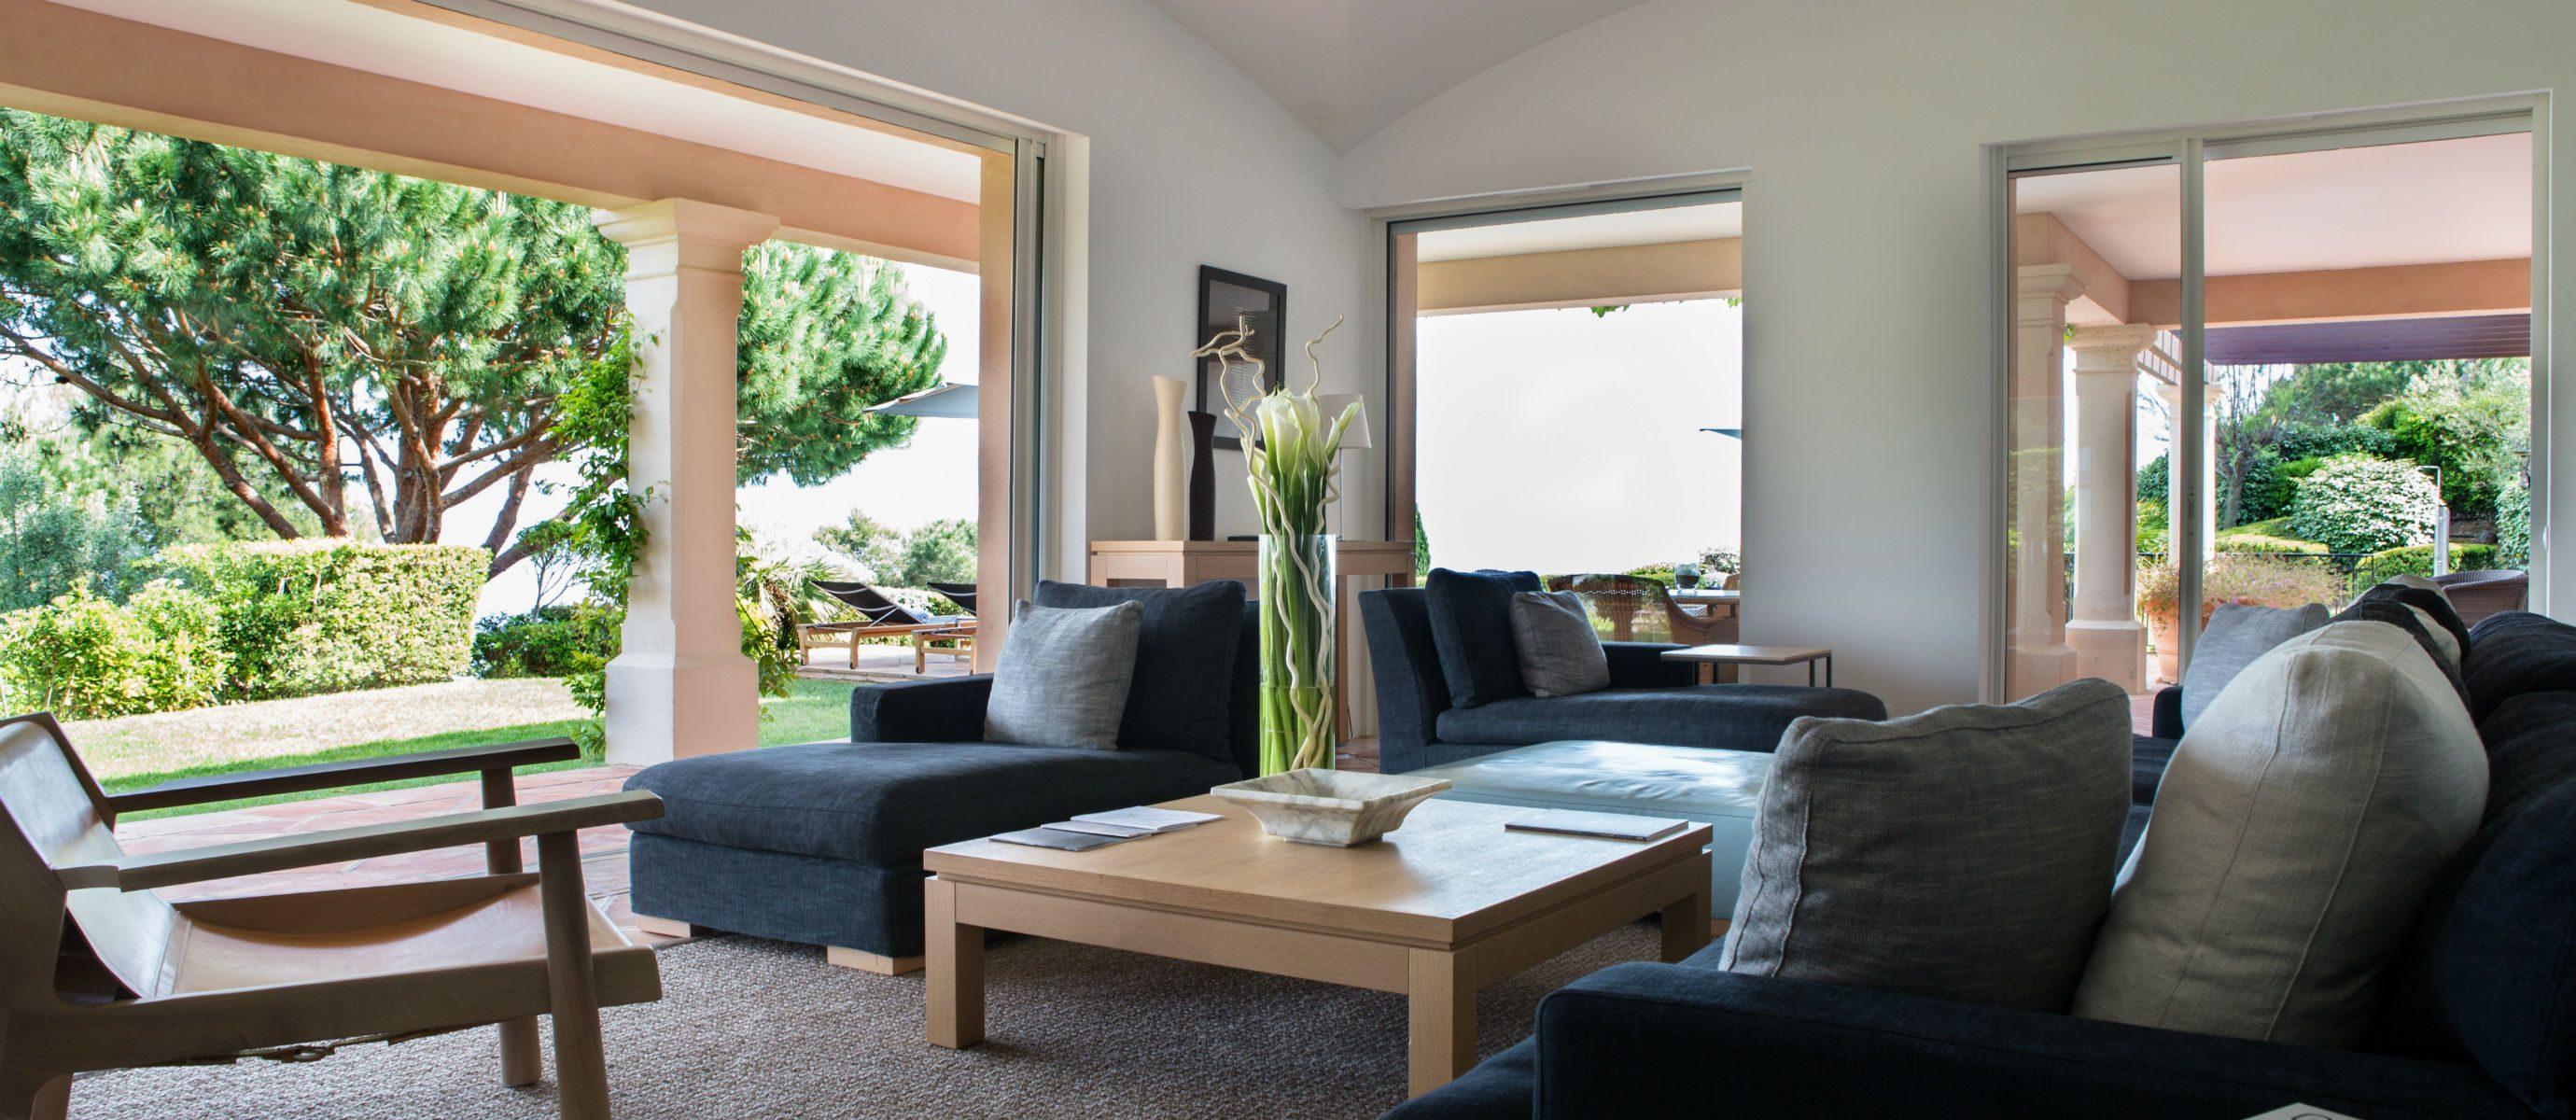 Villa-5.MAIN7-La-Reserve-Ramatuelle-Lounge-1